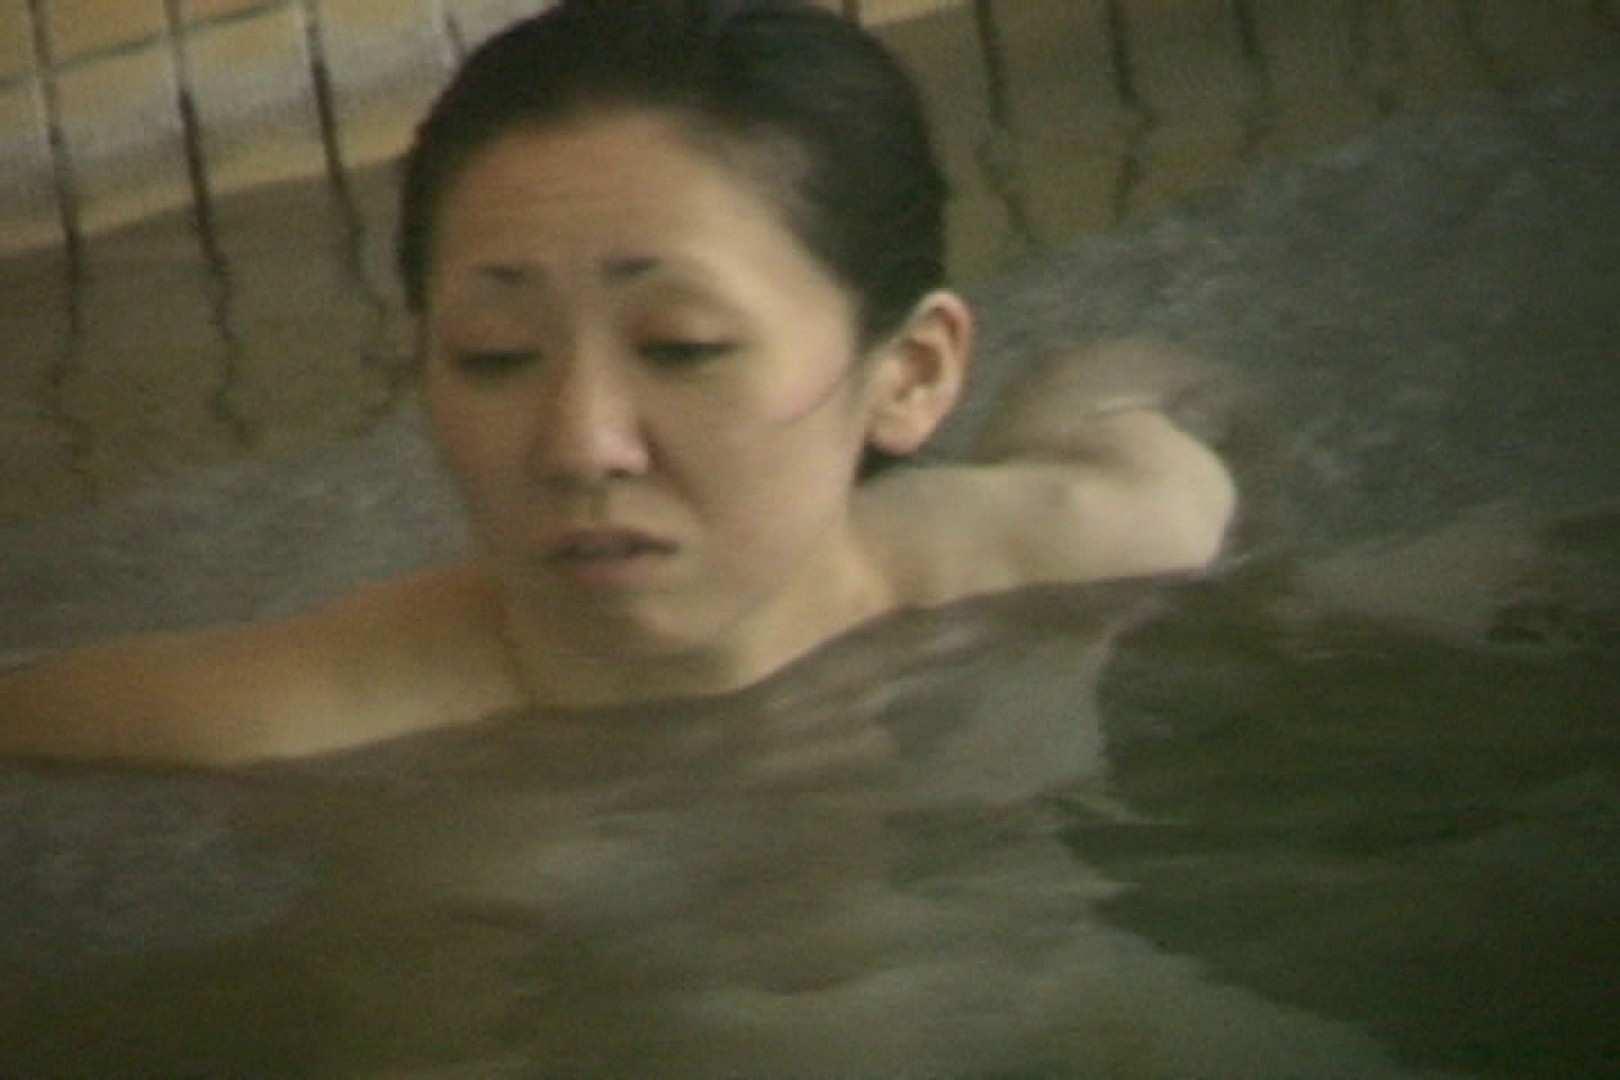 Aquaな露天風呂Vol.449 エッチな盗撮  93pic 16